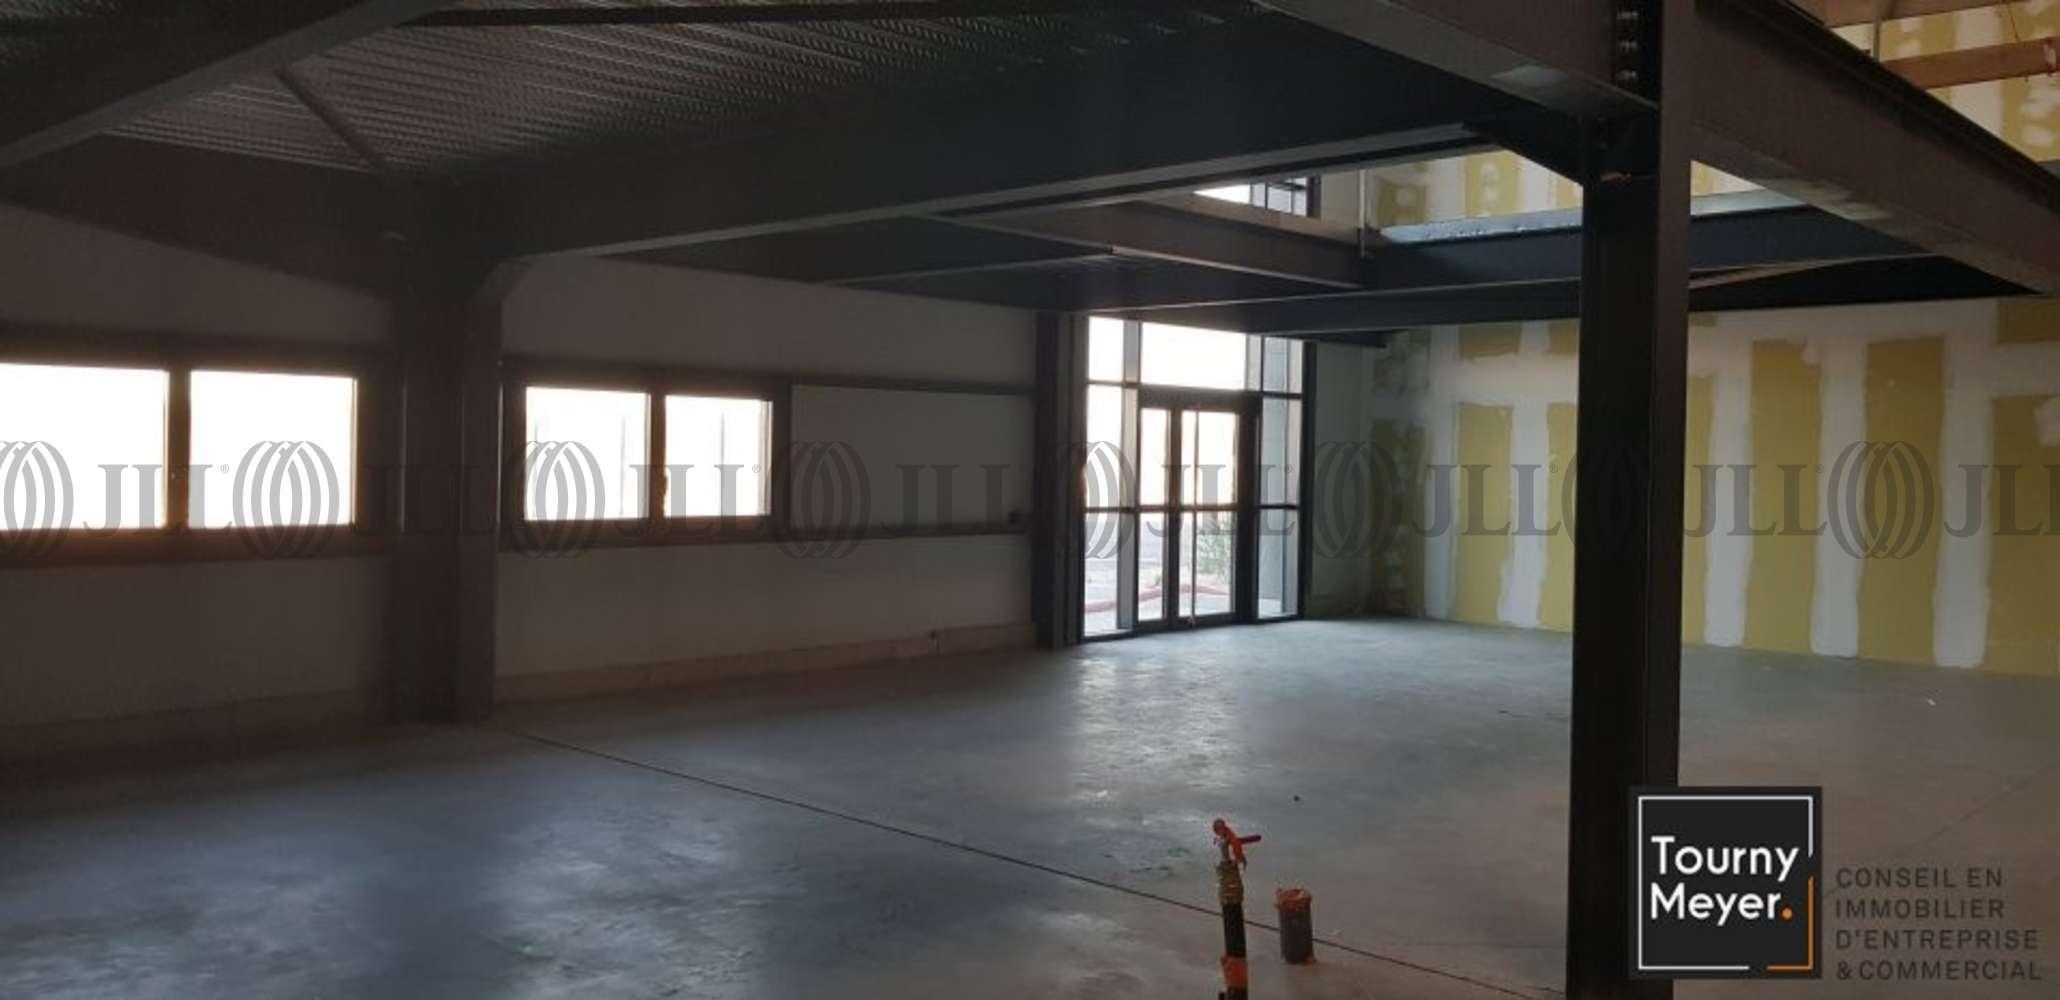 Activités/entrepôt Montbartier, 82700